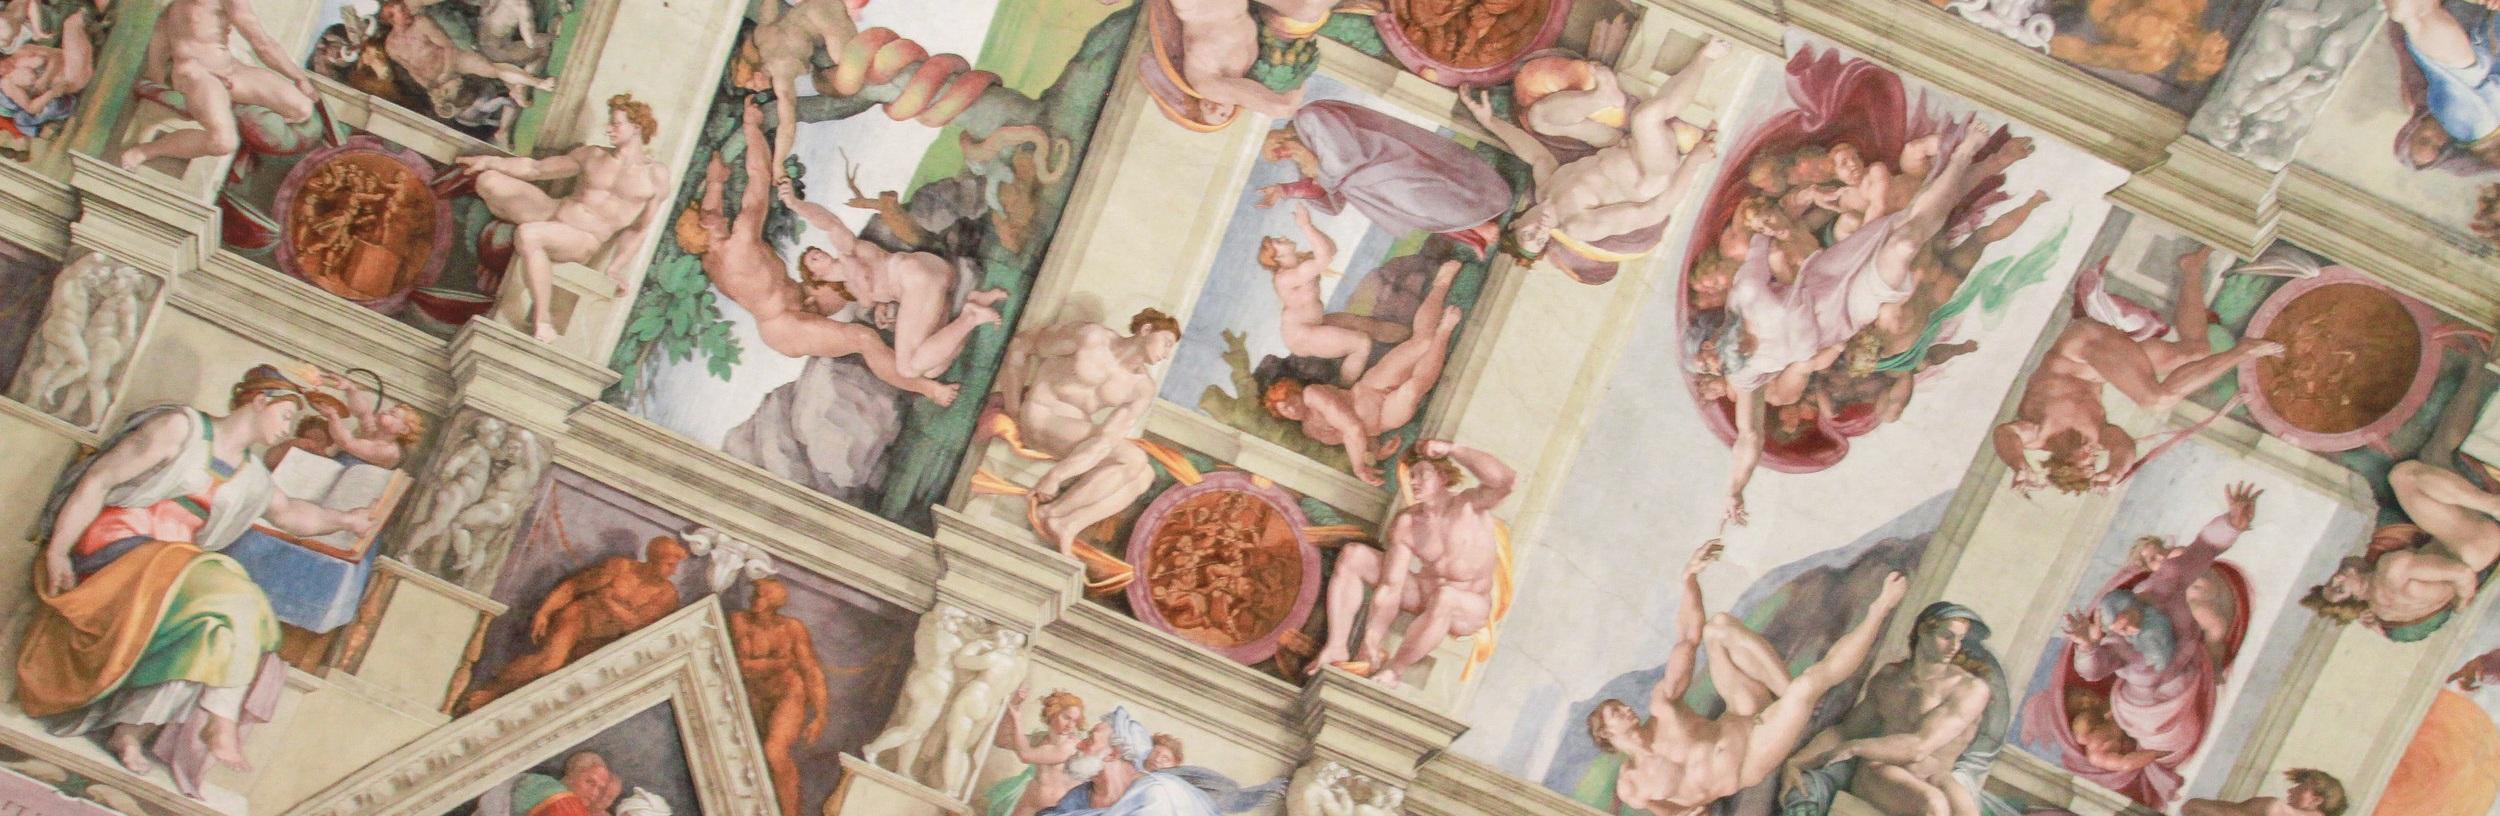 michelangelo sistine chapel vatican rome.jpg